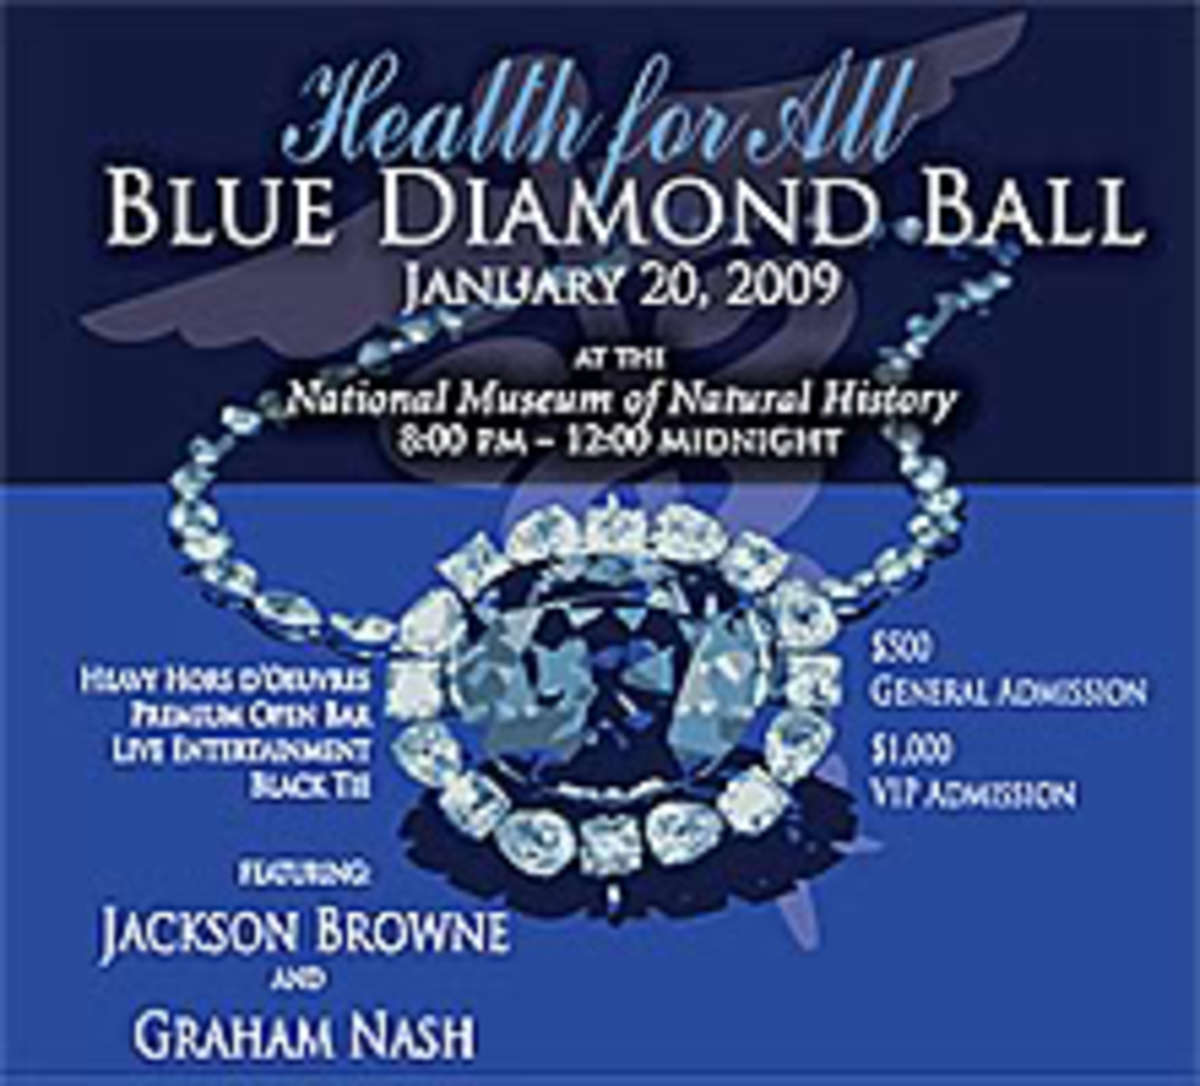 bluediamondball1